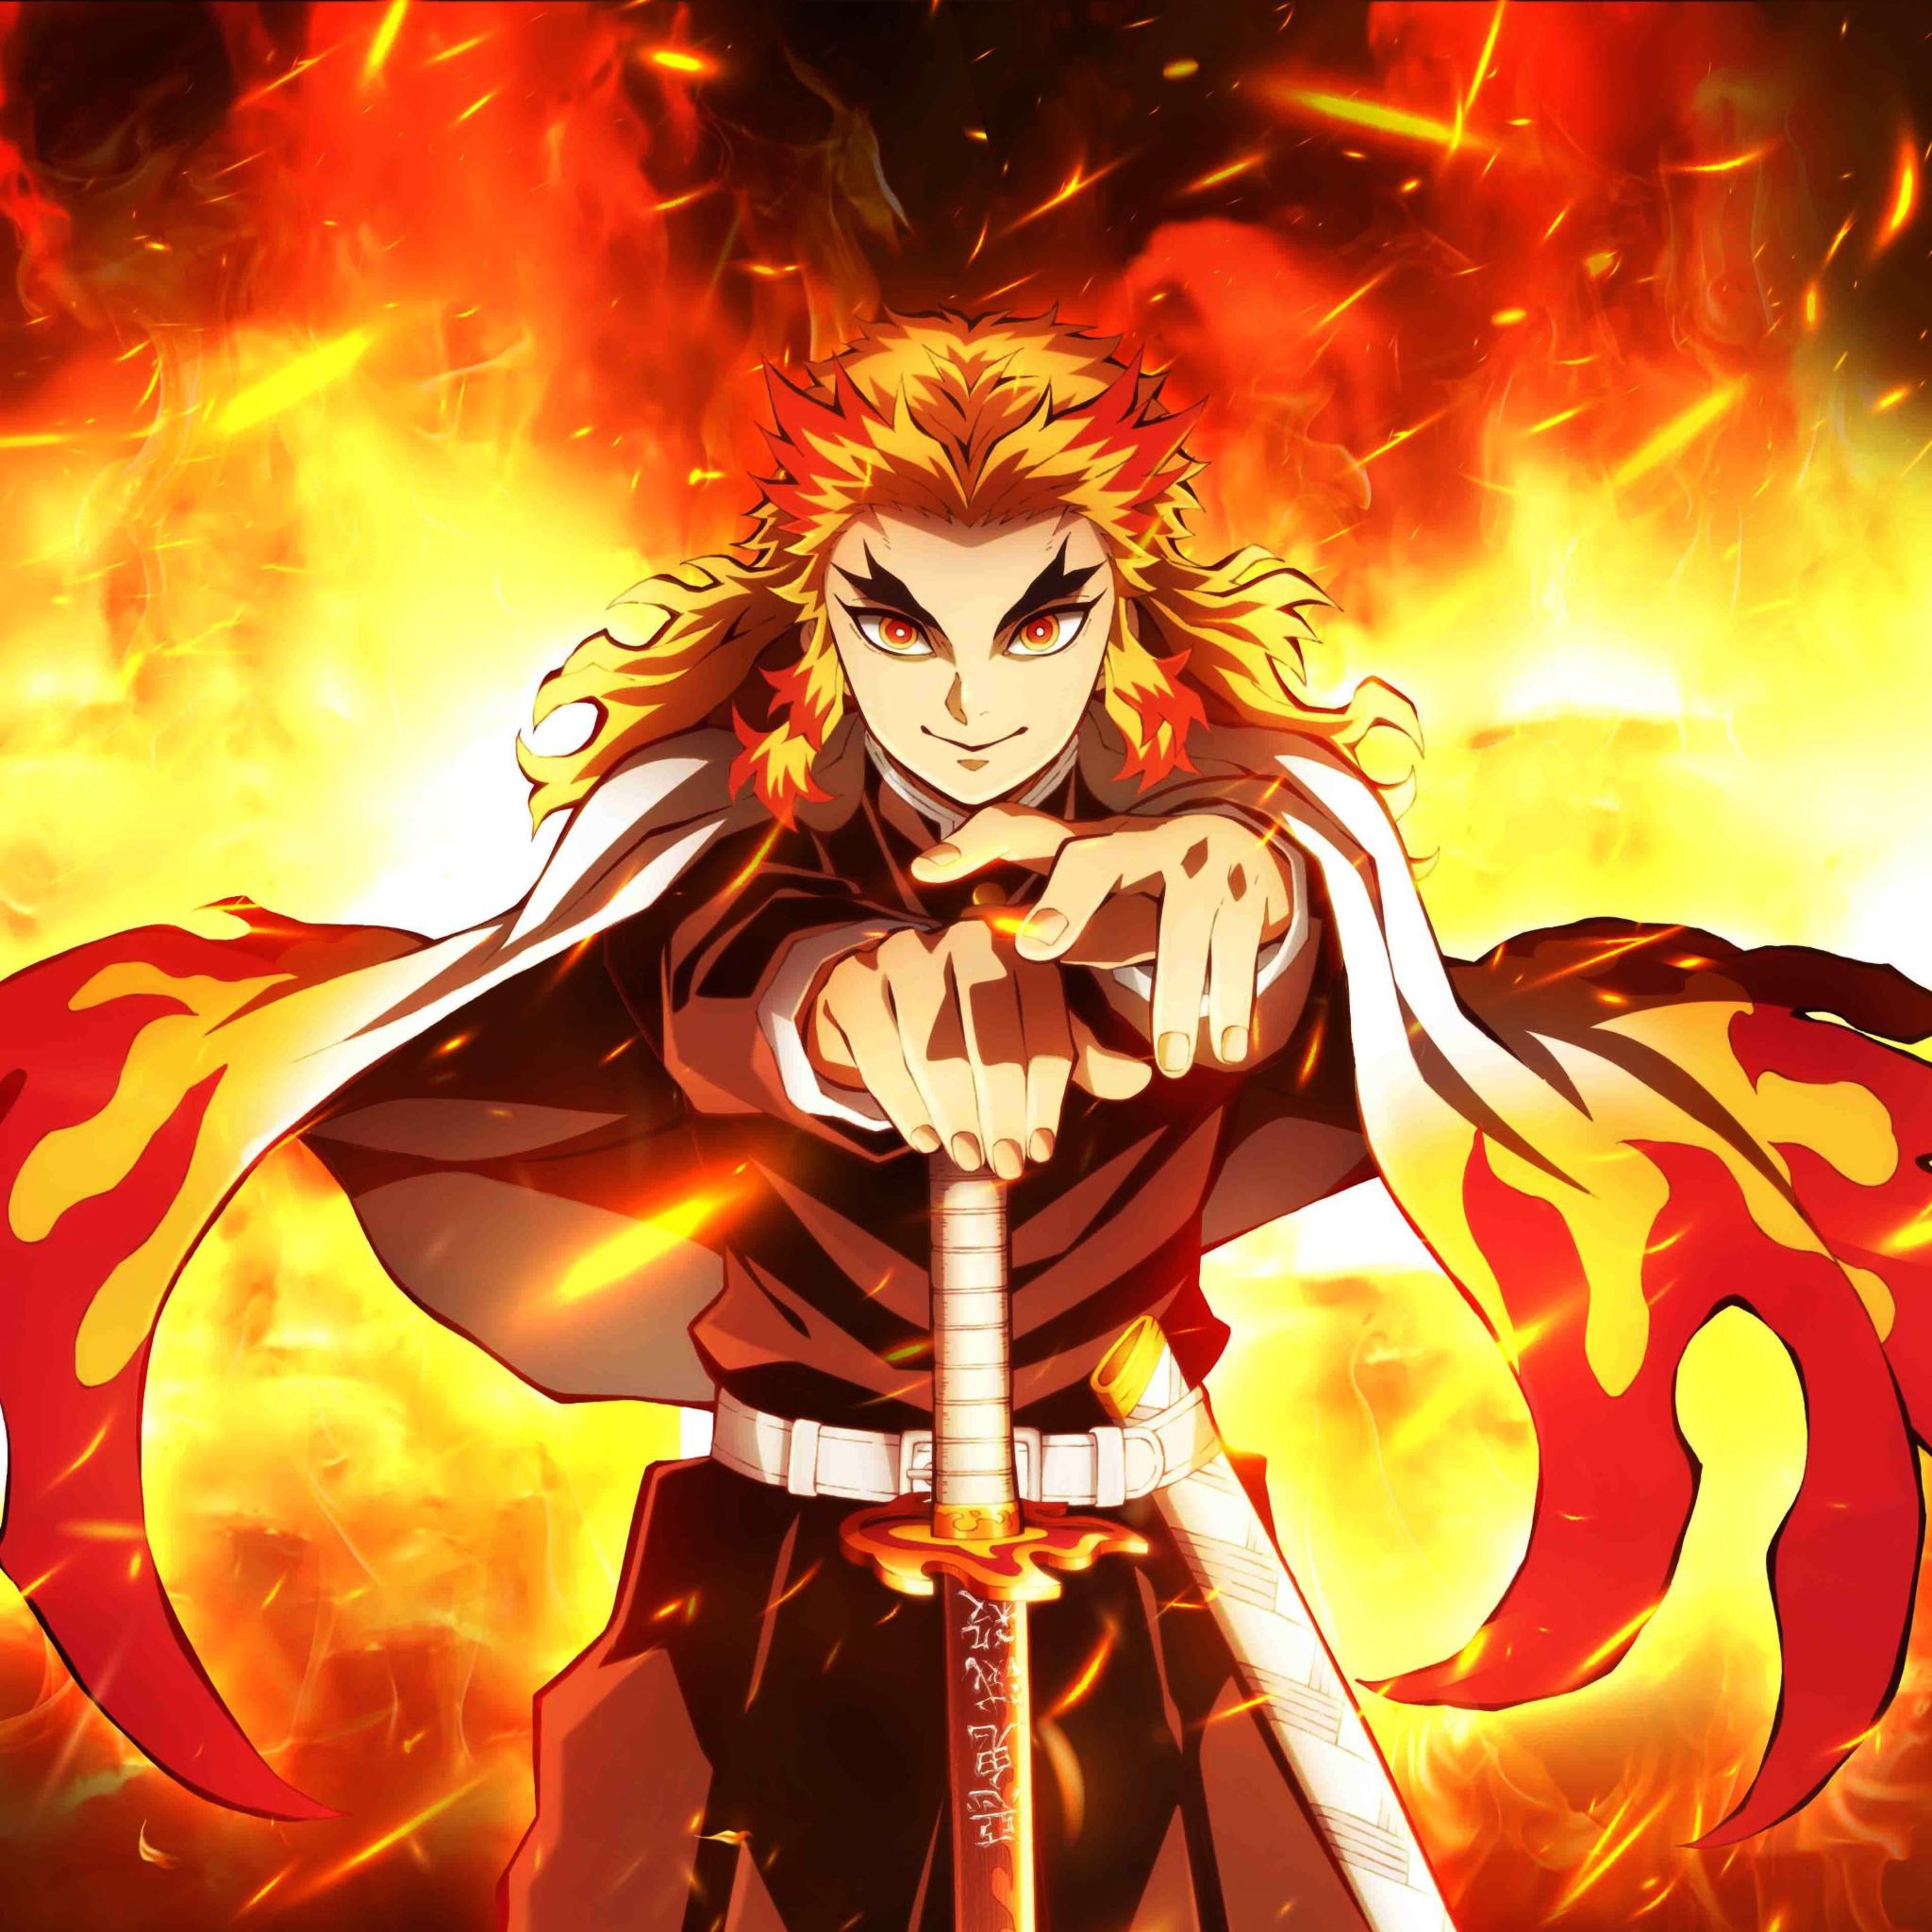 2048x2048 Rengoku Demon Slayer Ipad Air Wallpaper, HD ...